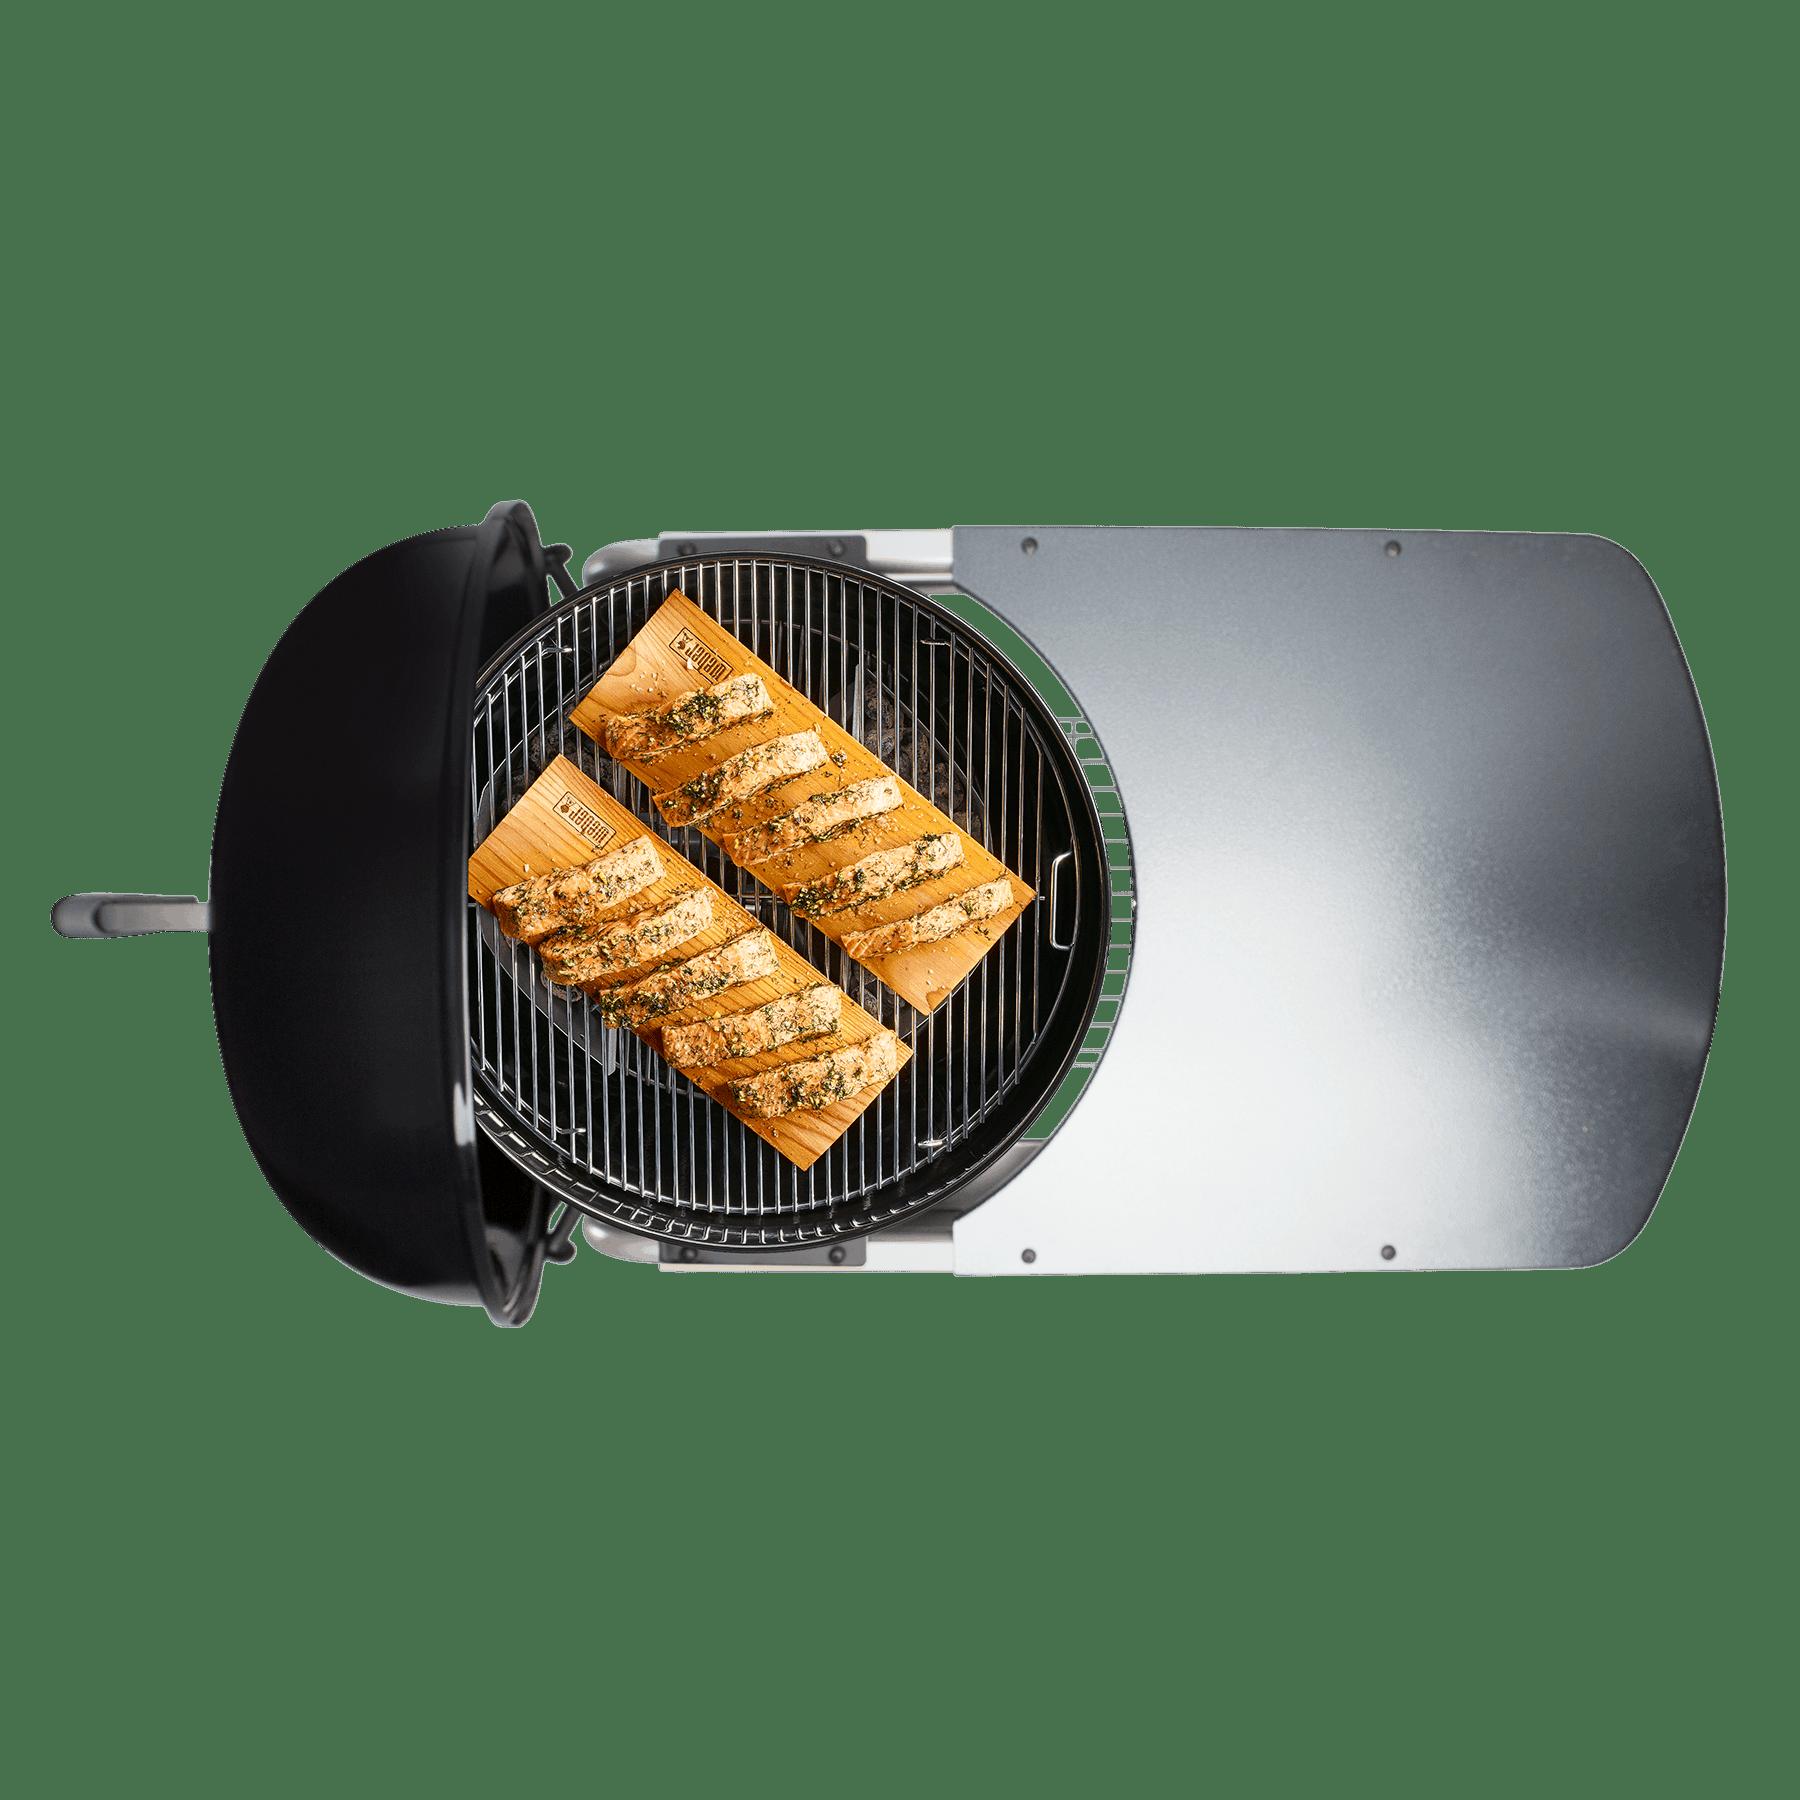 Performer Premium GBS – Holzkohlegrill Ø 57 cm